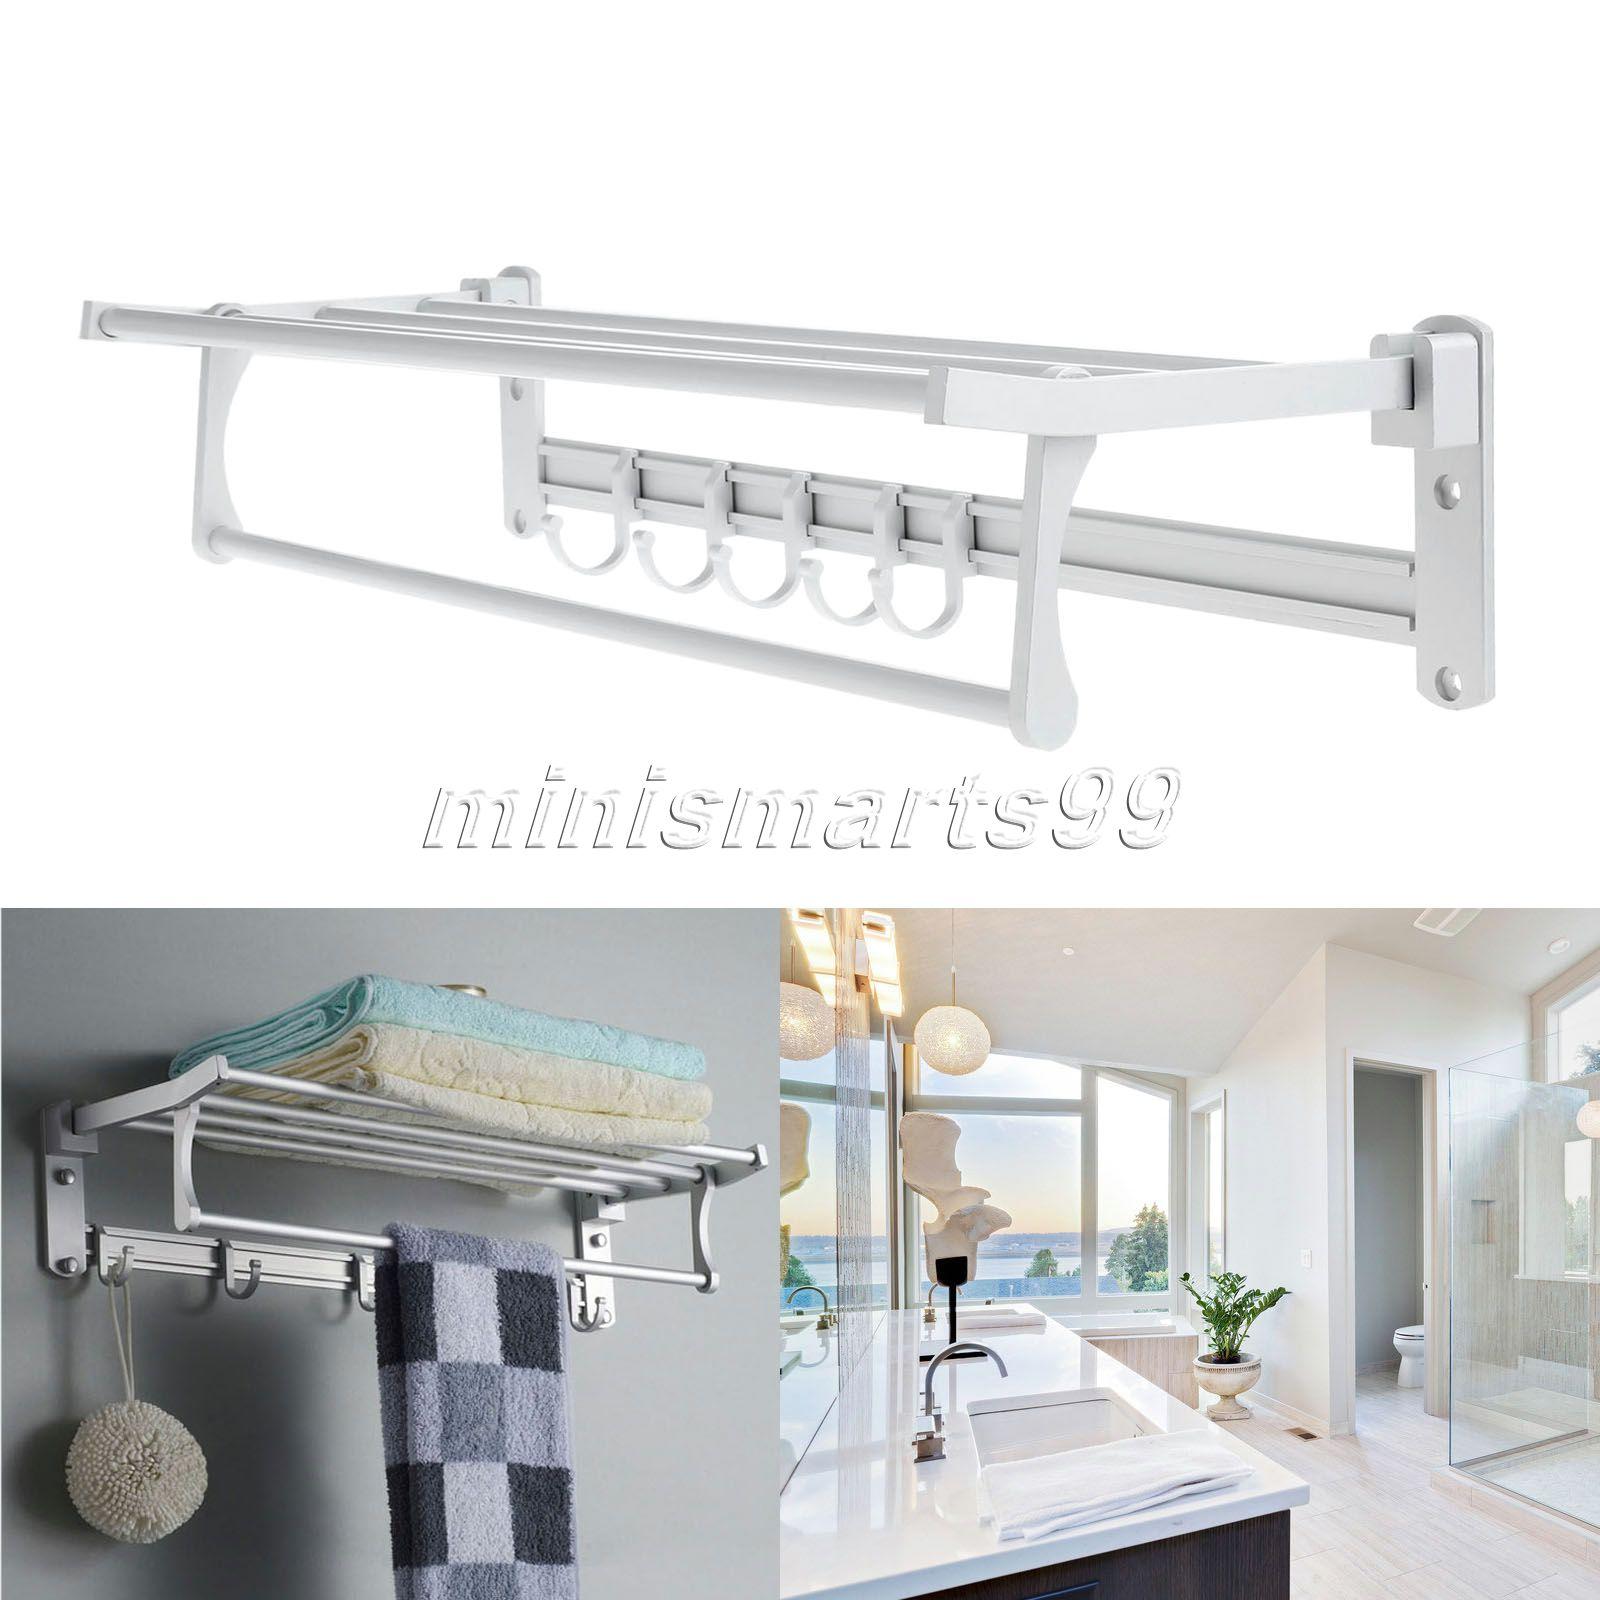 bathroom towel shelf nice design | a1houston